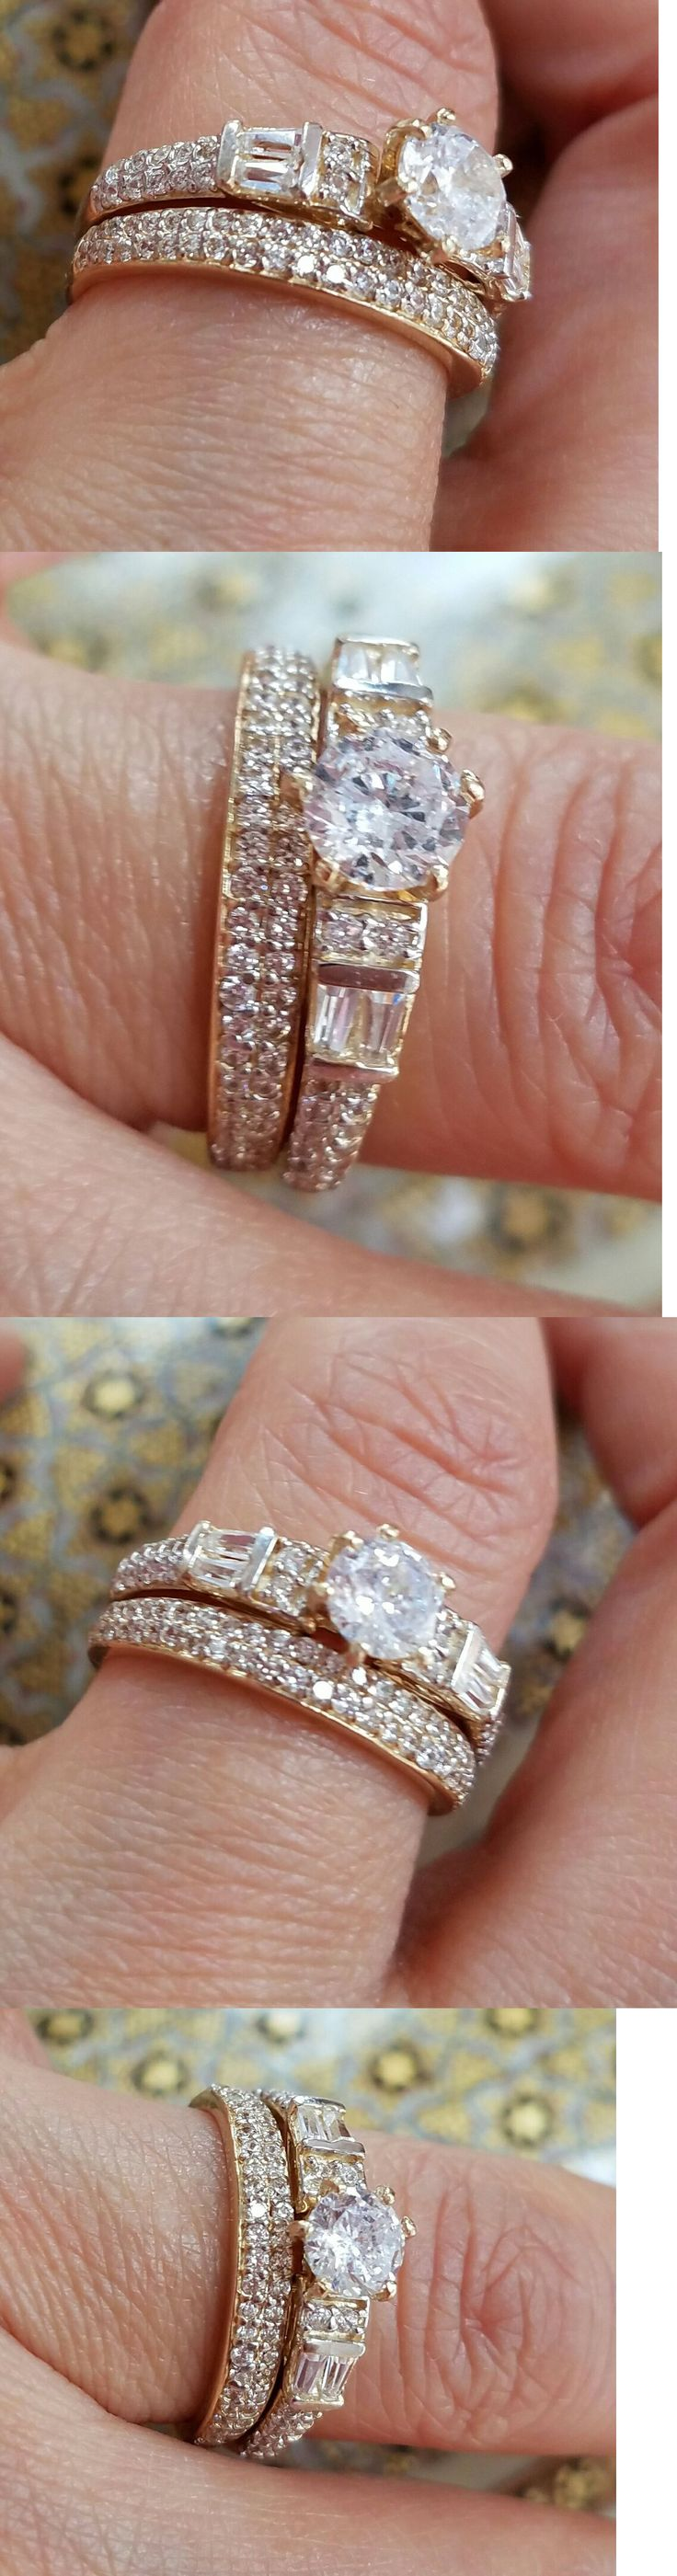 ebay eheringe ebay wedding ring sets Diamonds and Gemstones Solid 14K Yellow Gold 0 50 Round Man Made Diamond Engagement And